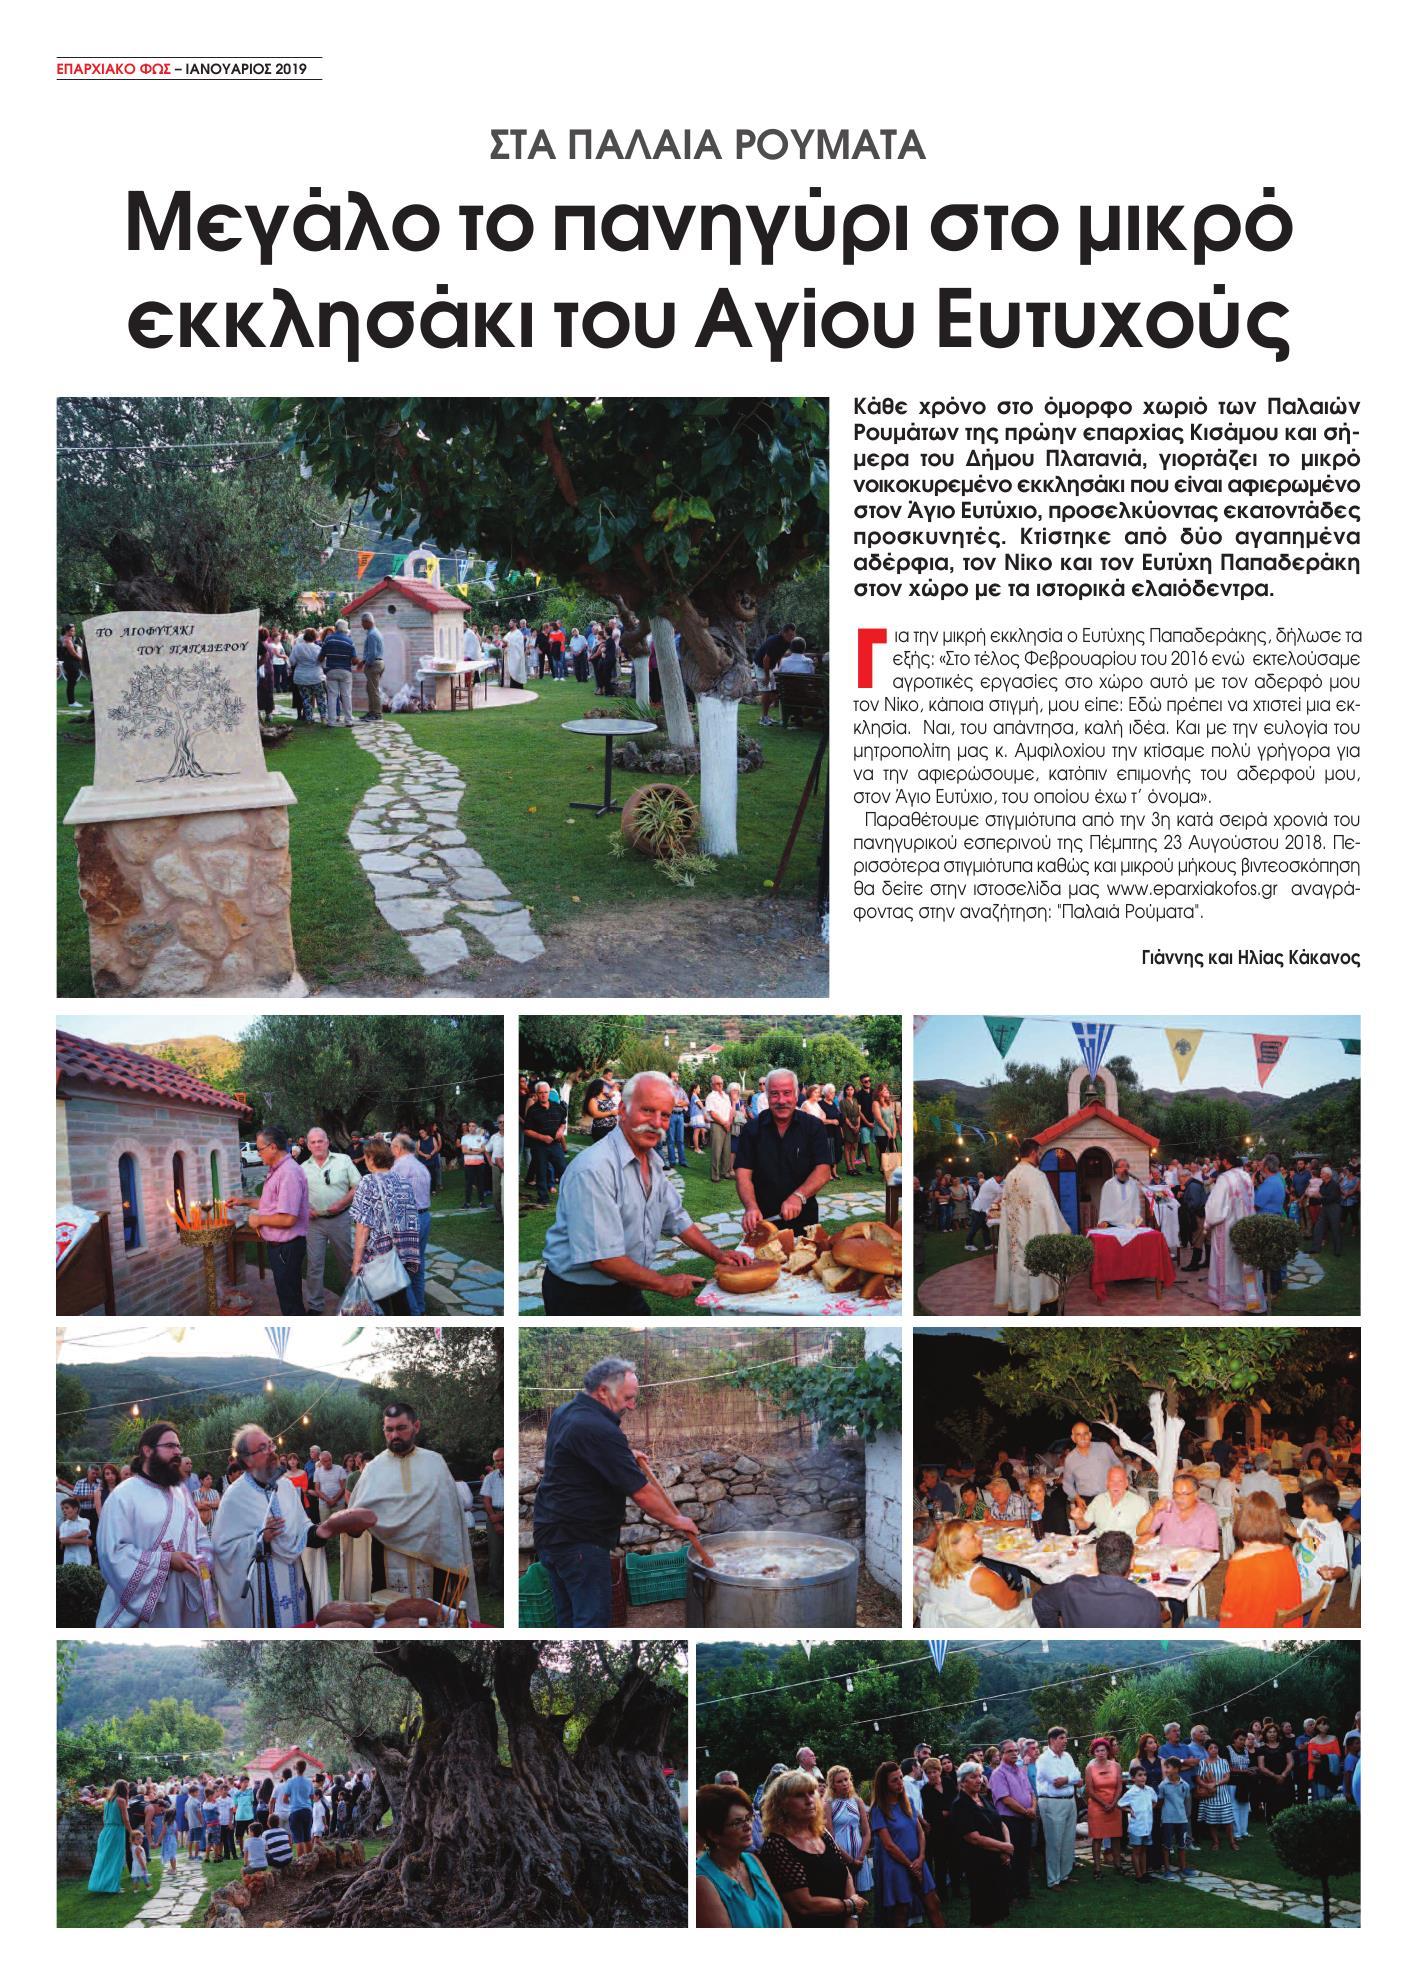 23 KAKANOULHS (Page 04)